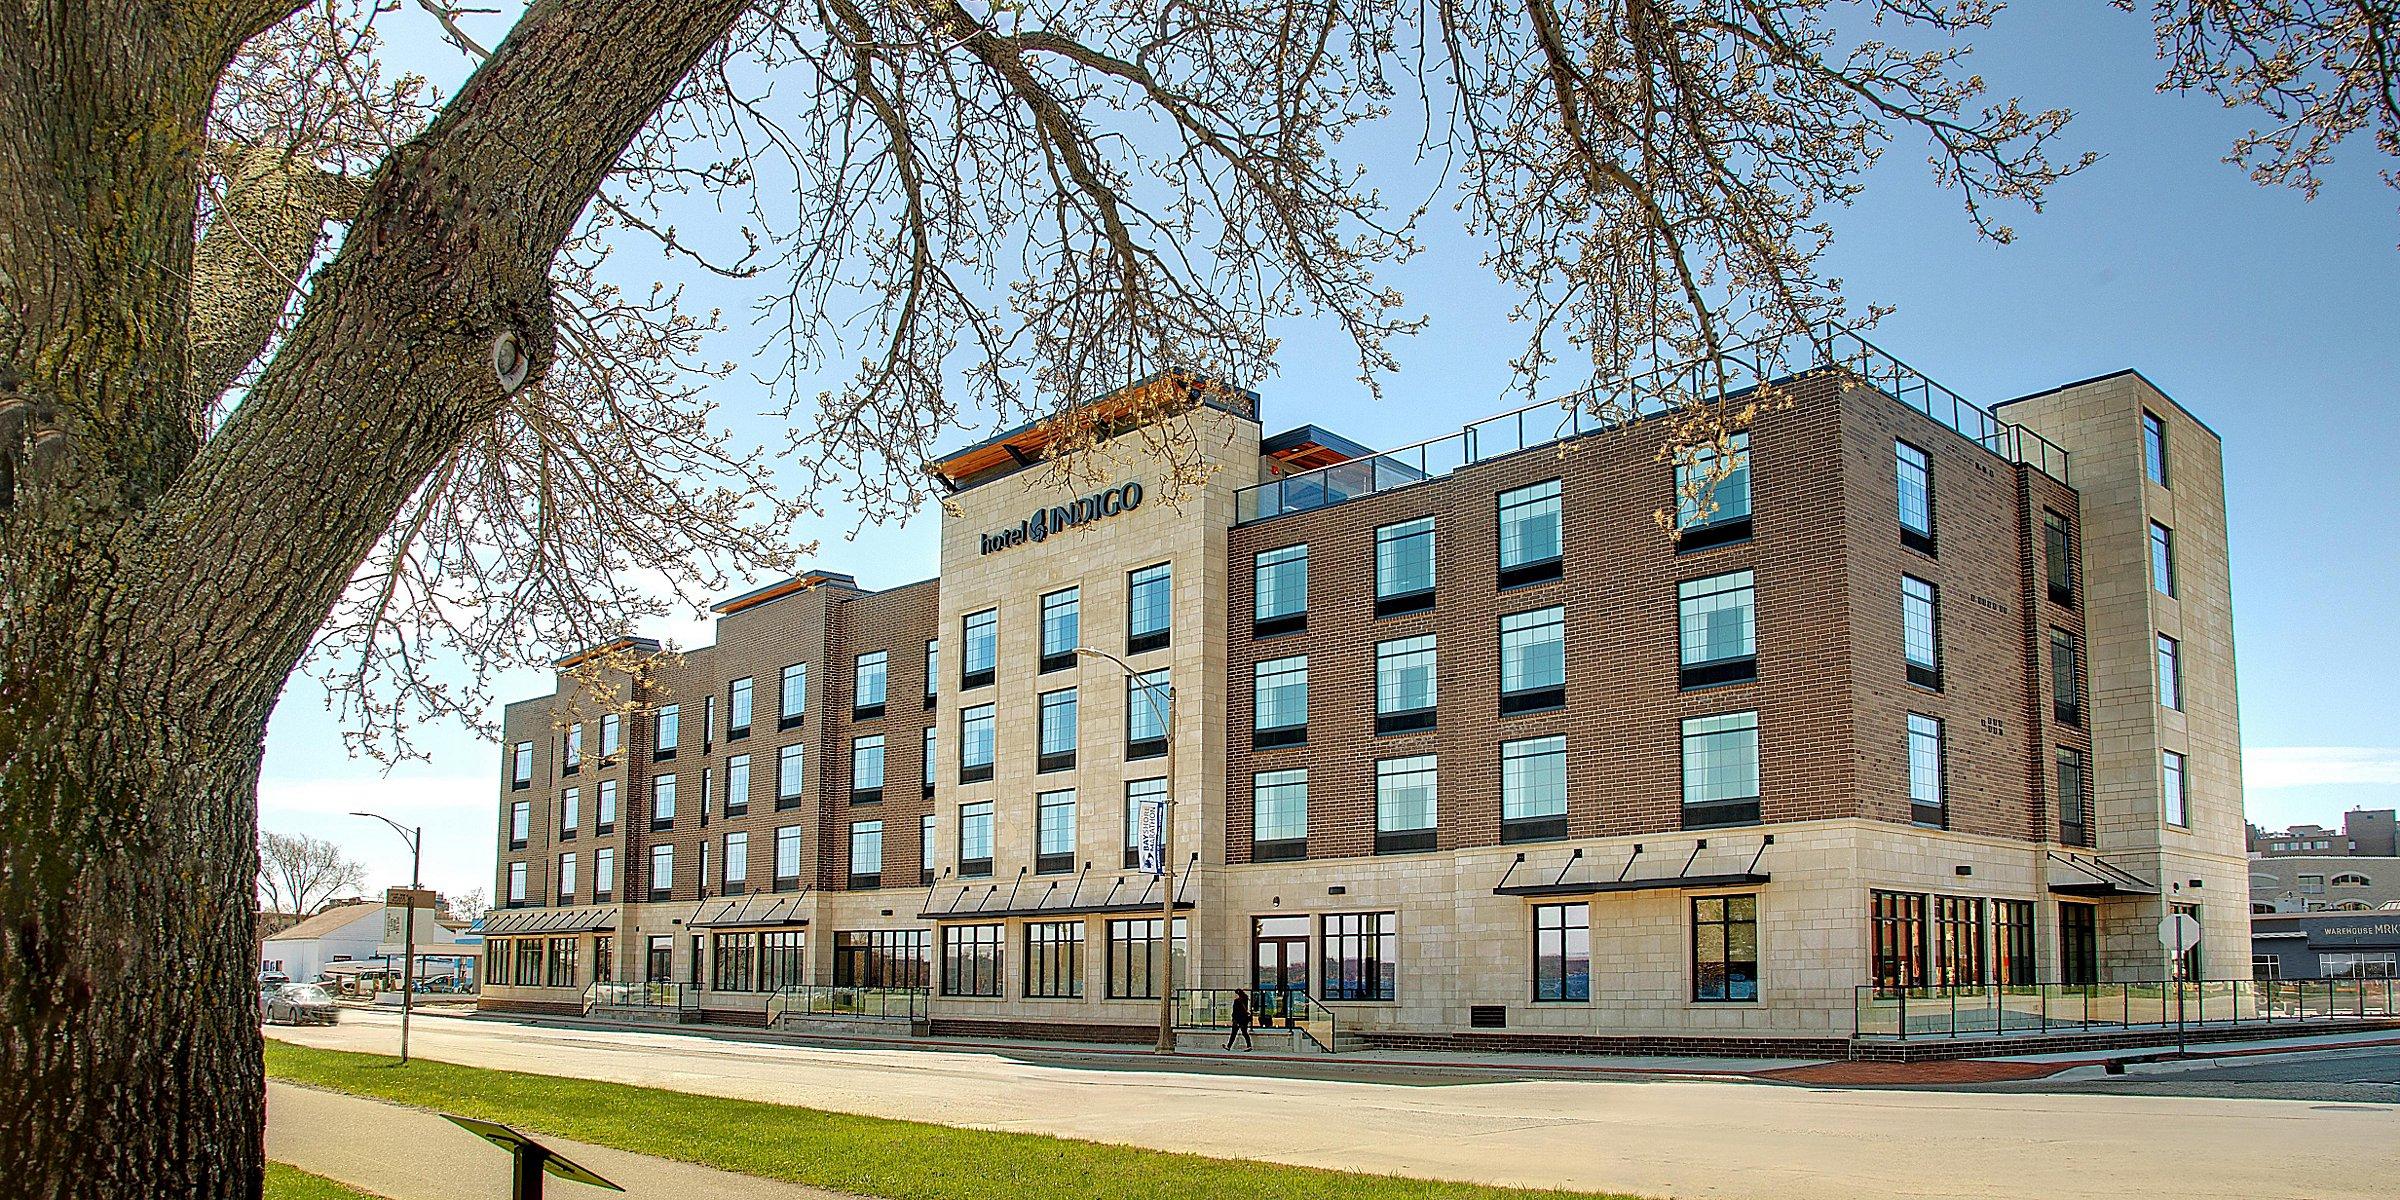 Traverse City Hotels: Hotel Indigo Traverse City Hotel in